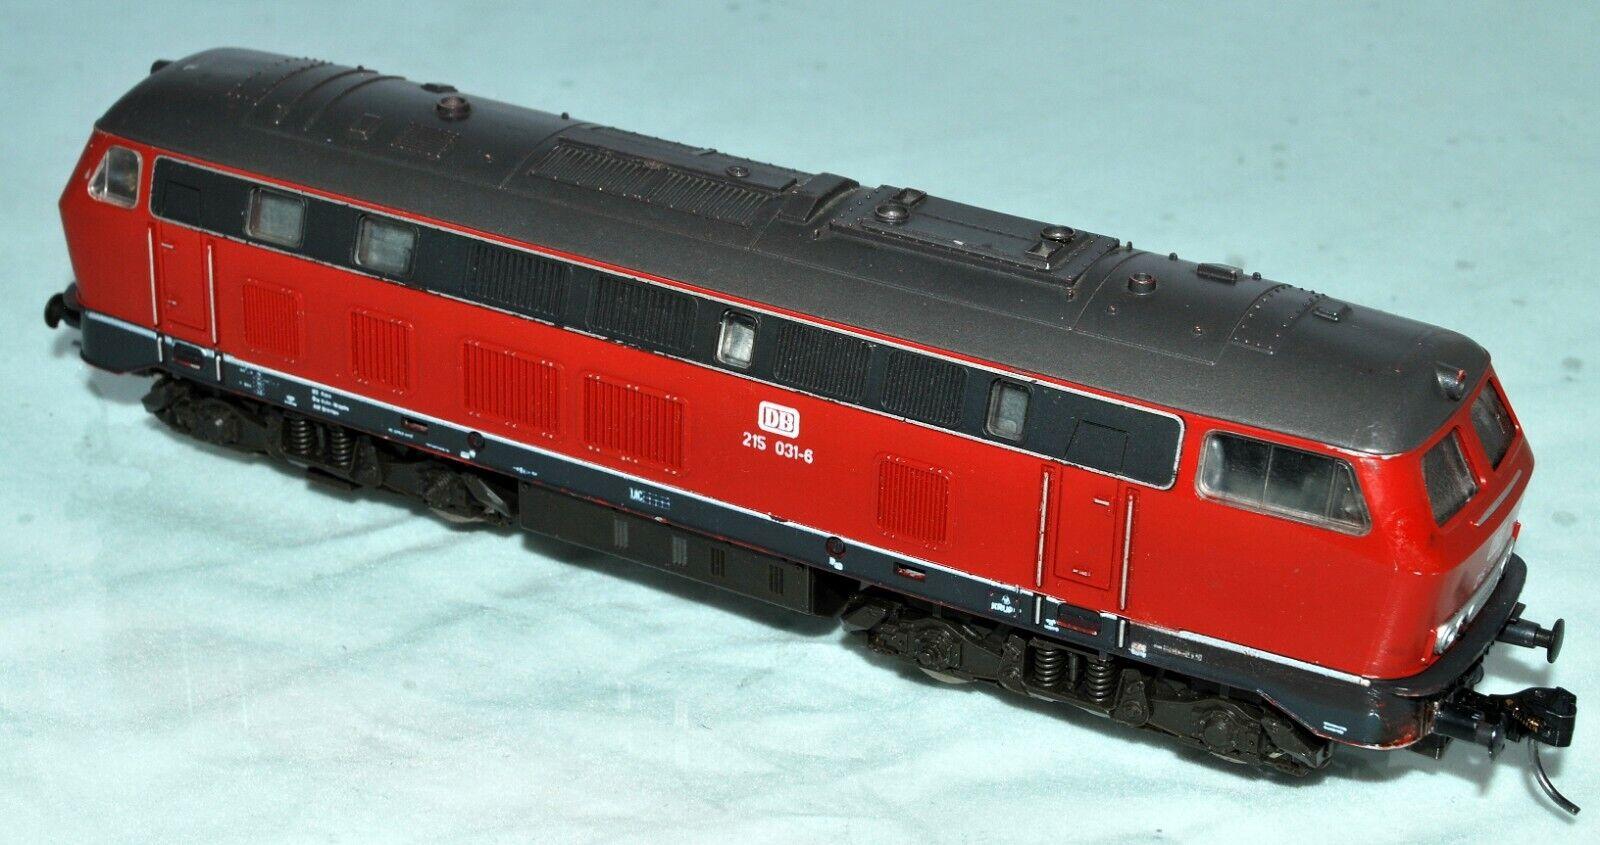 Roco 4151 HO Class 215 031-9 DCC Digital loco  v.f.c